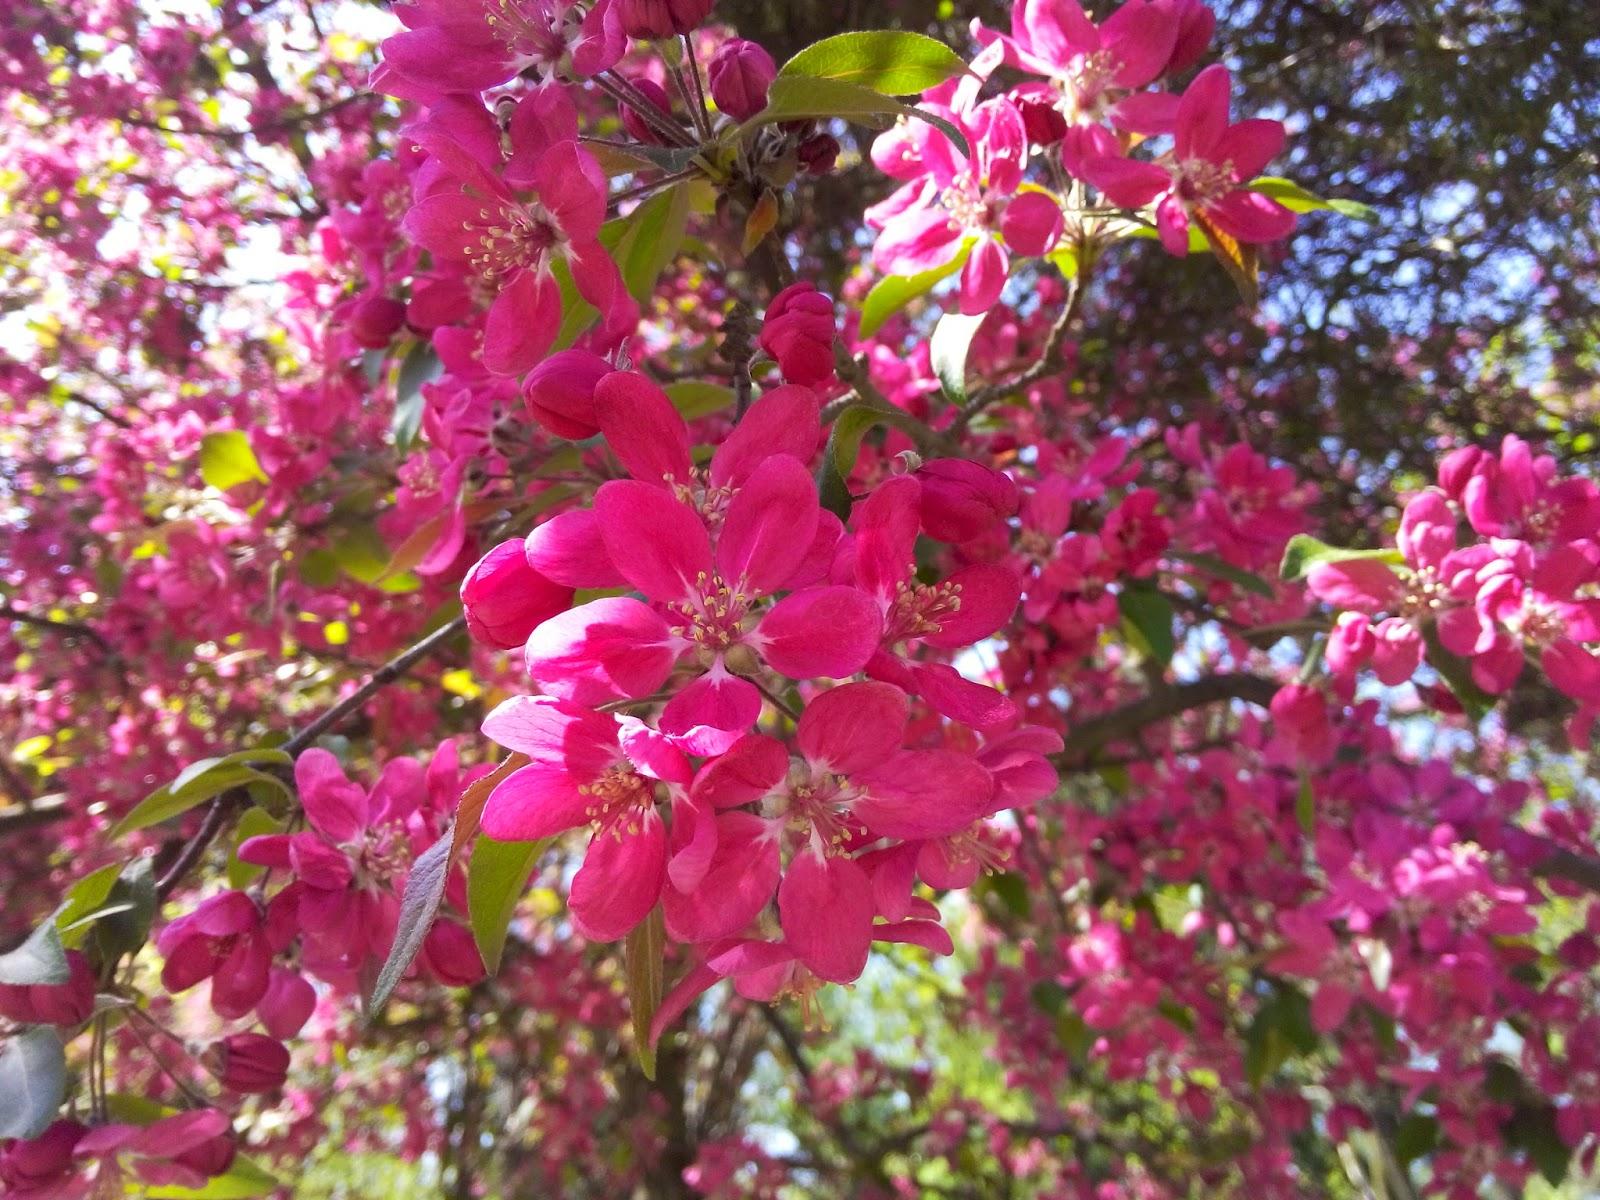 Iubesc natura arbusti ornamentali flori roz for Arbusti ornamentali